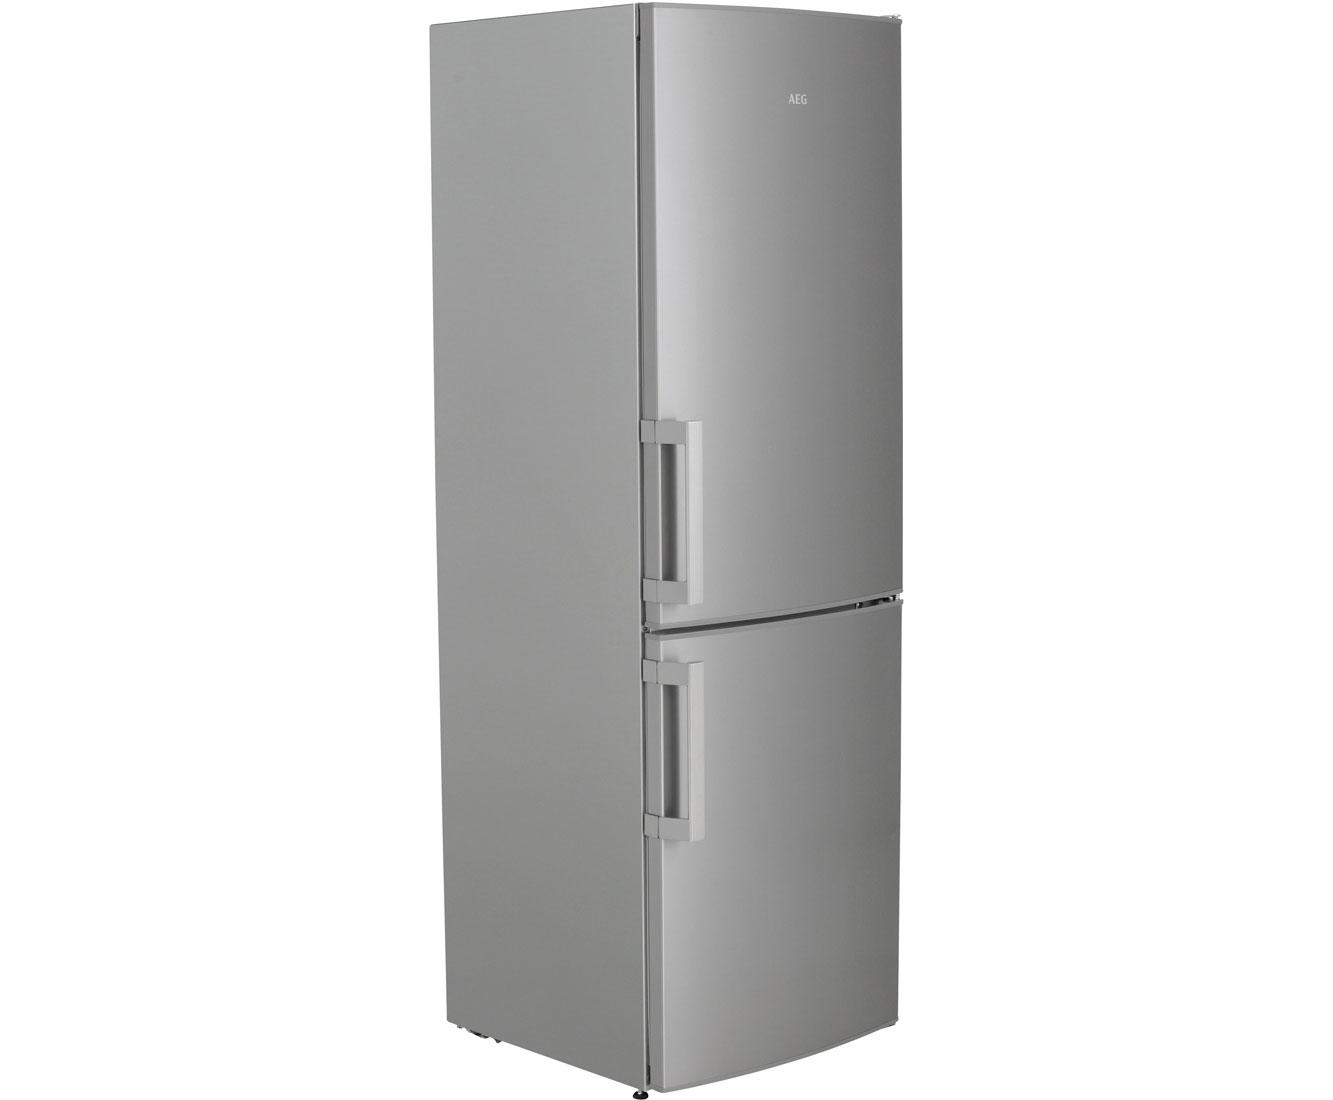 Aeg Kühlschrank Pro Fresh : Aeg santo rcb ox kühl gefrierkombination mit no frost